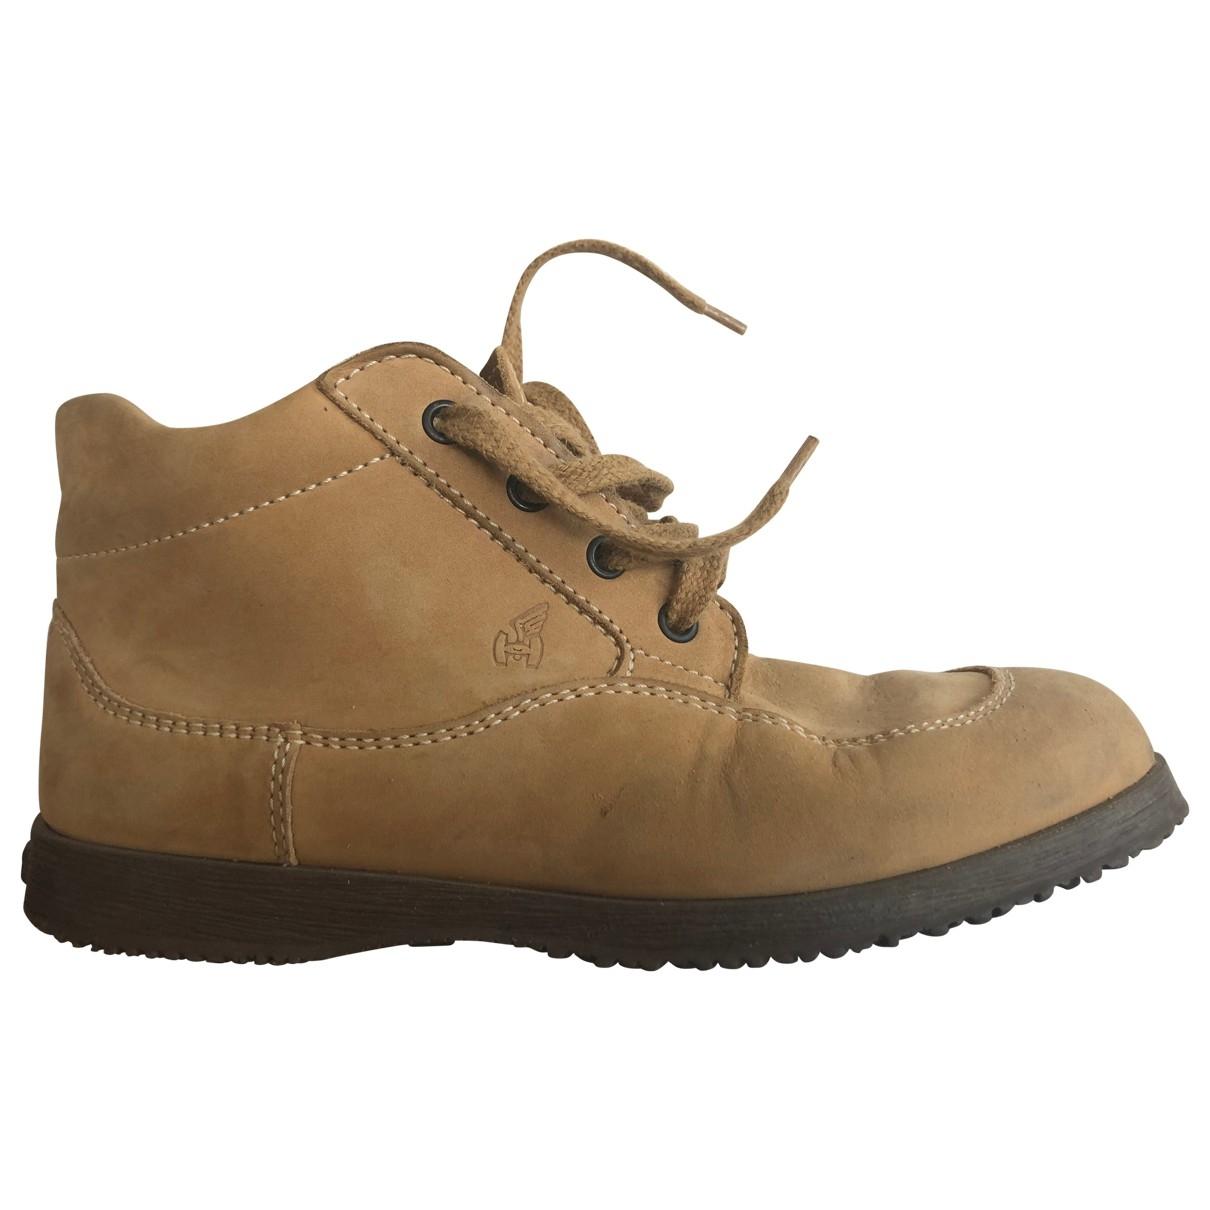 Hogan \N Beige Suede Ankle boots for Women 37 EU